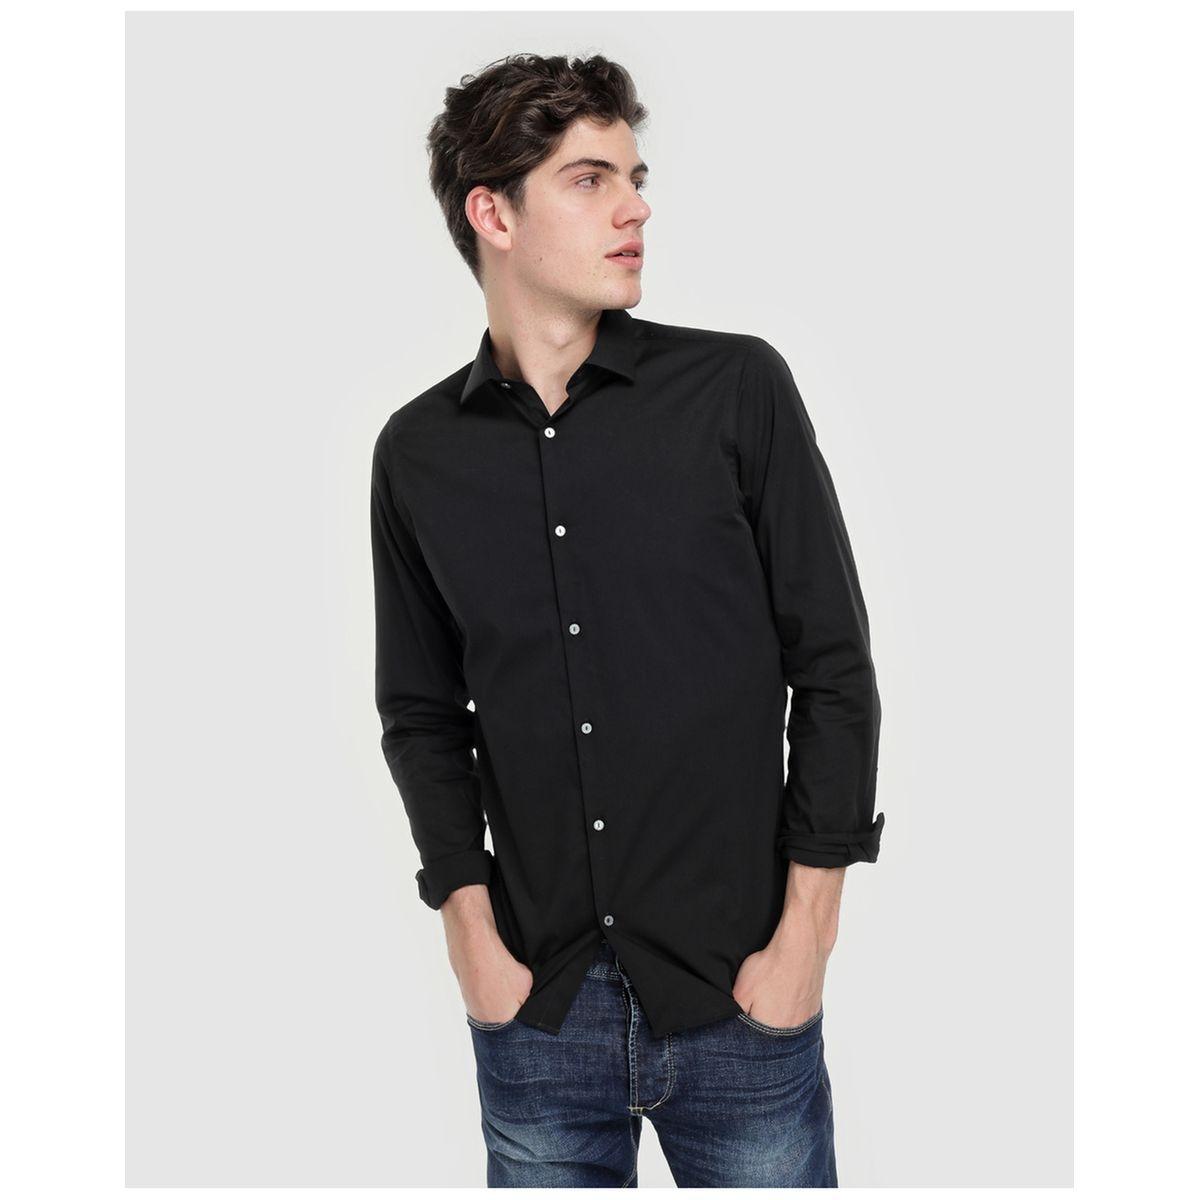 Chemise habillée skinny unie